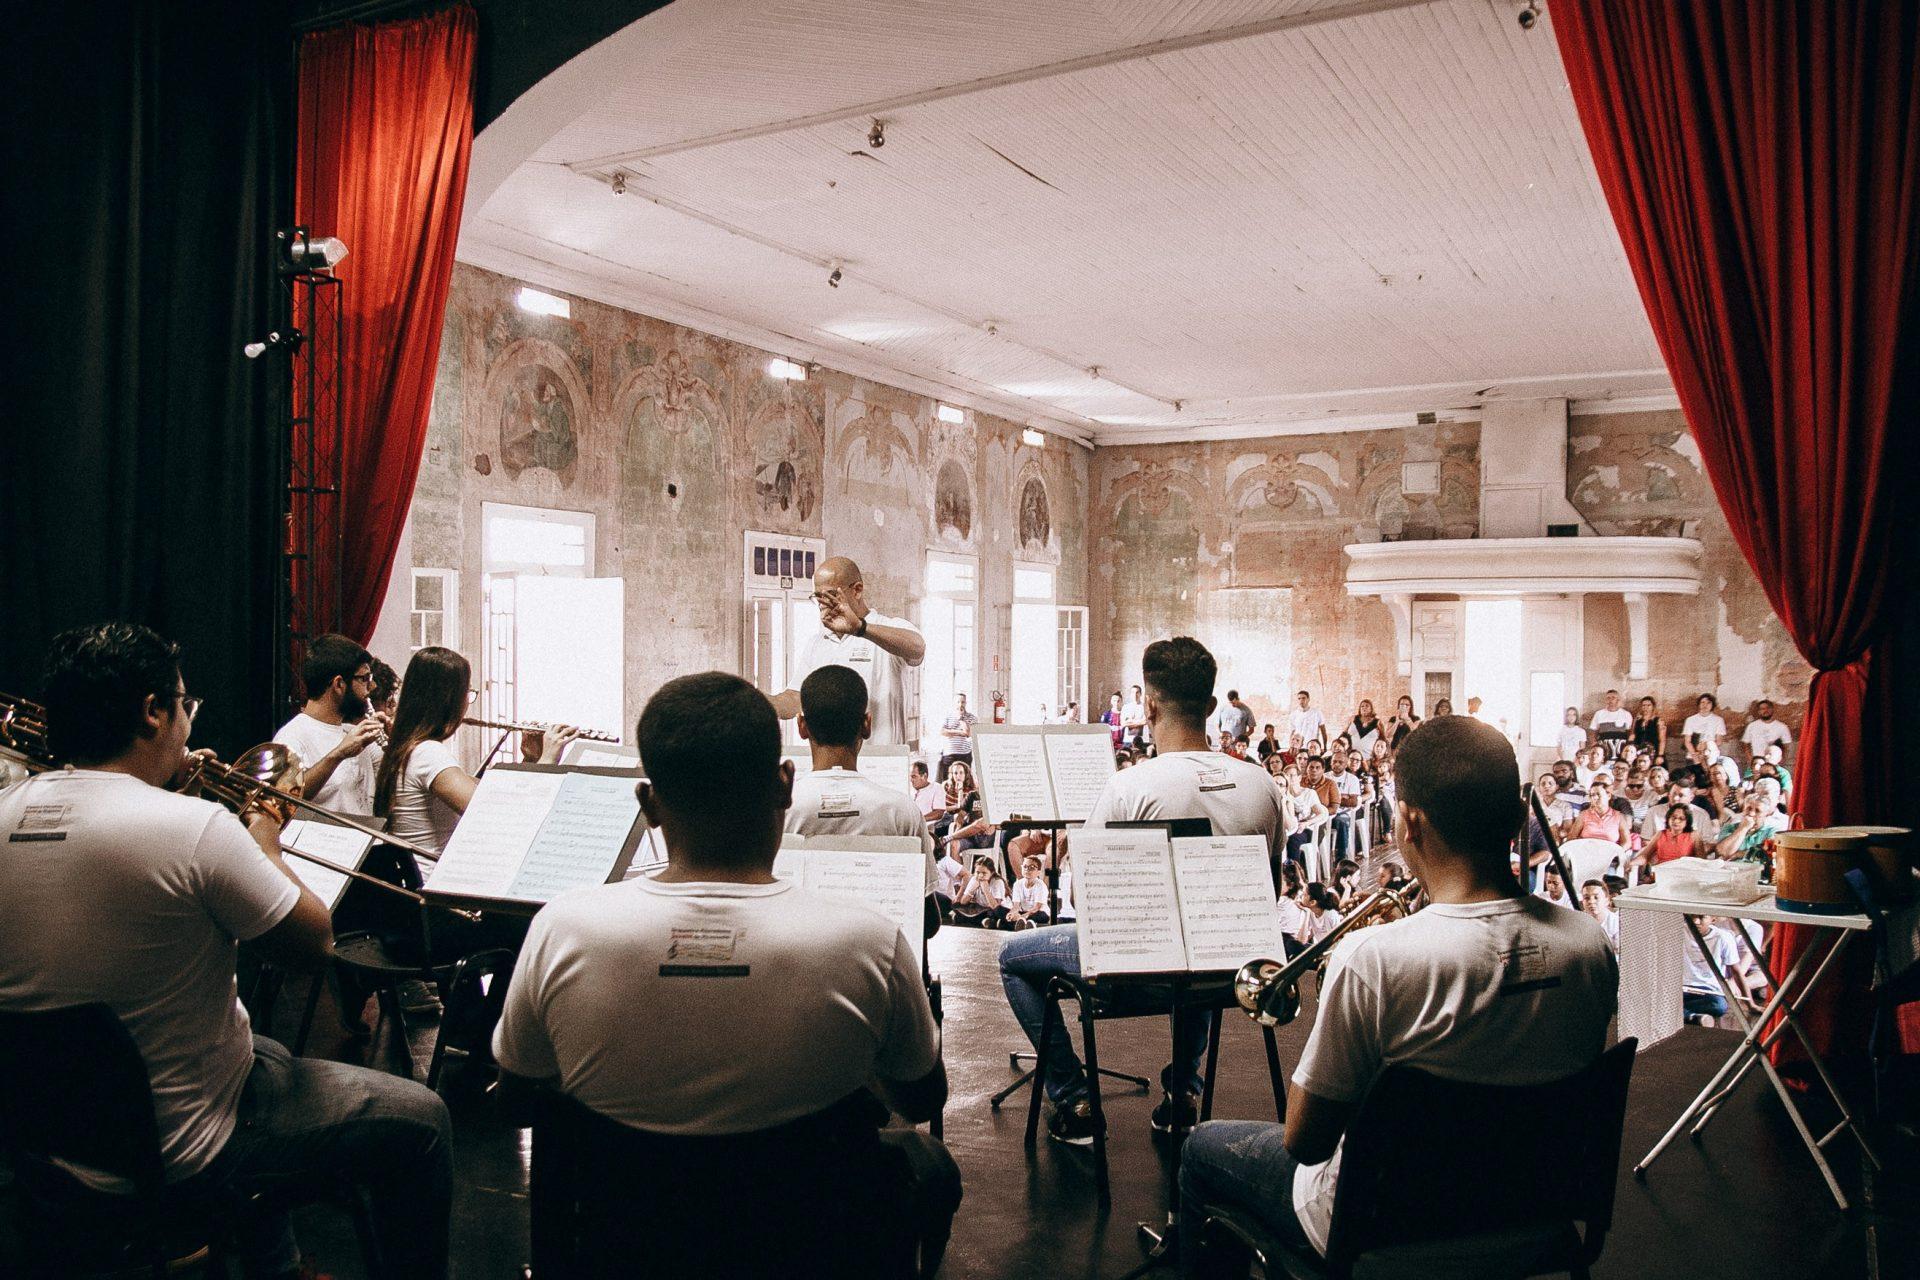 Projeto Jovens Músicos realiza Concertos de Natal